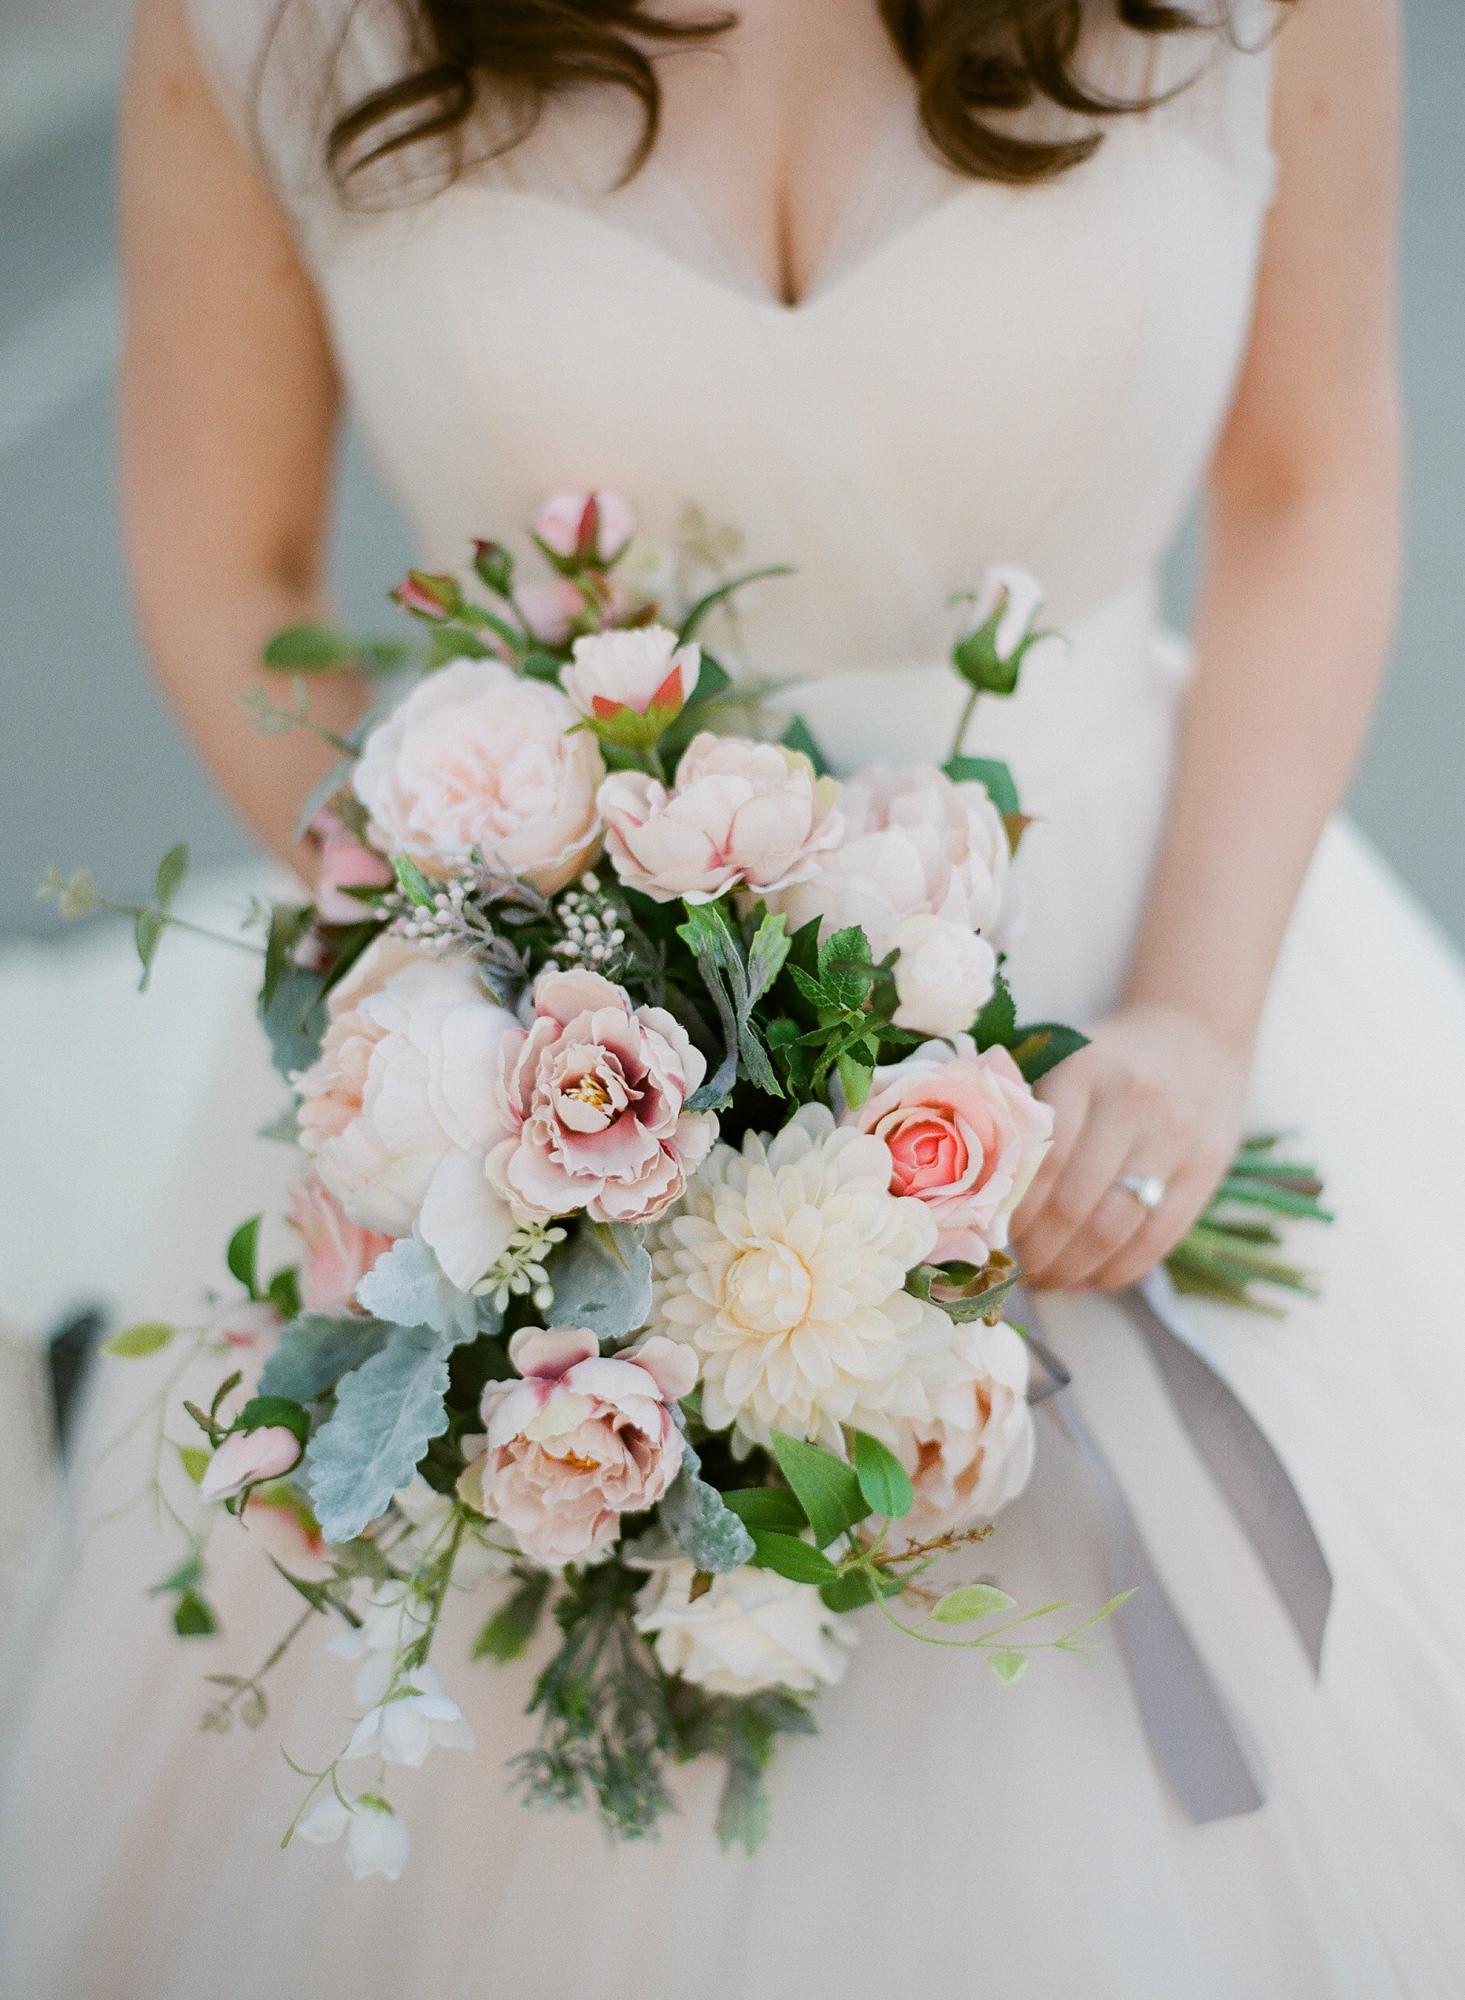 pink-peony-rose-dahlia-bouquet-worlds-best-wedding-photos-greg-finck-france-wedding-photographers